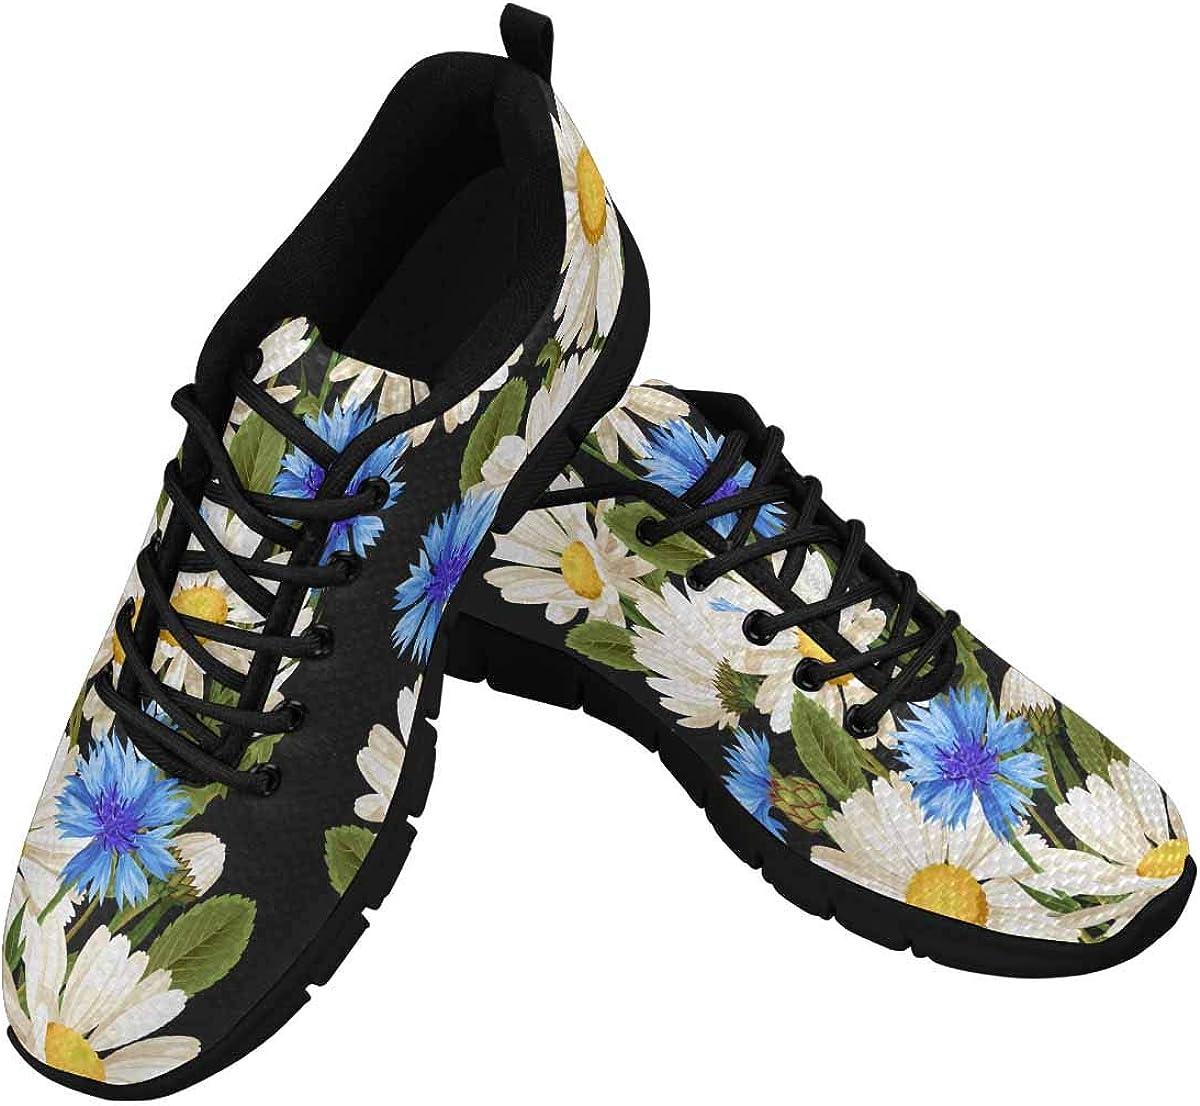 INTERESTPRINT Meadow Flowers Lightweight Mesh Breathable Sneakers for Women